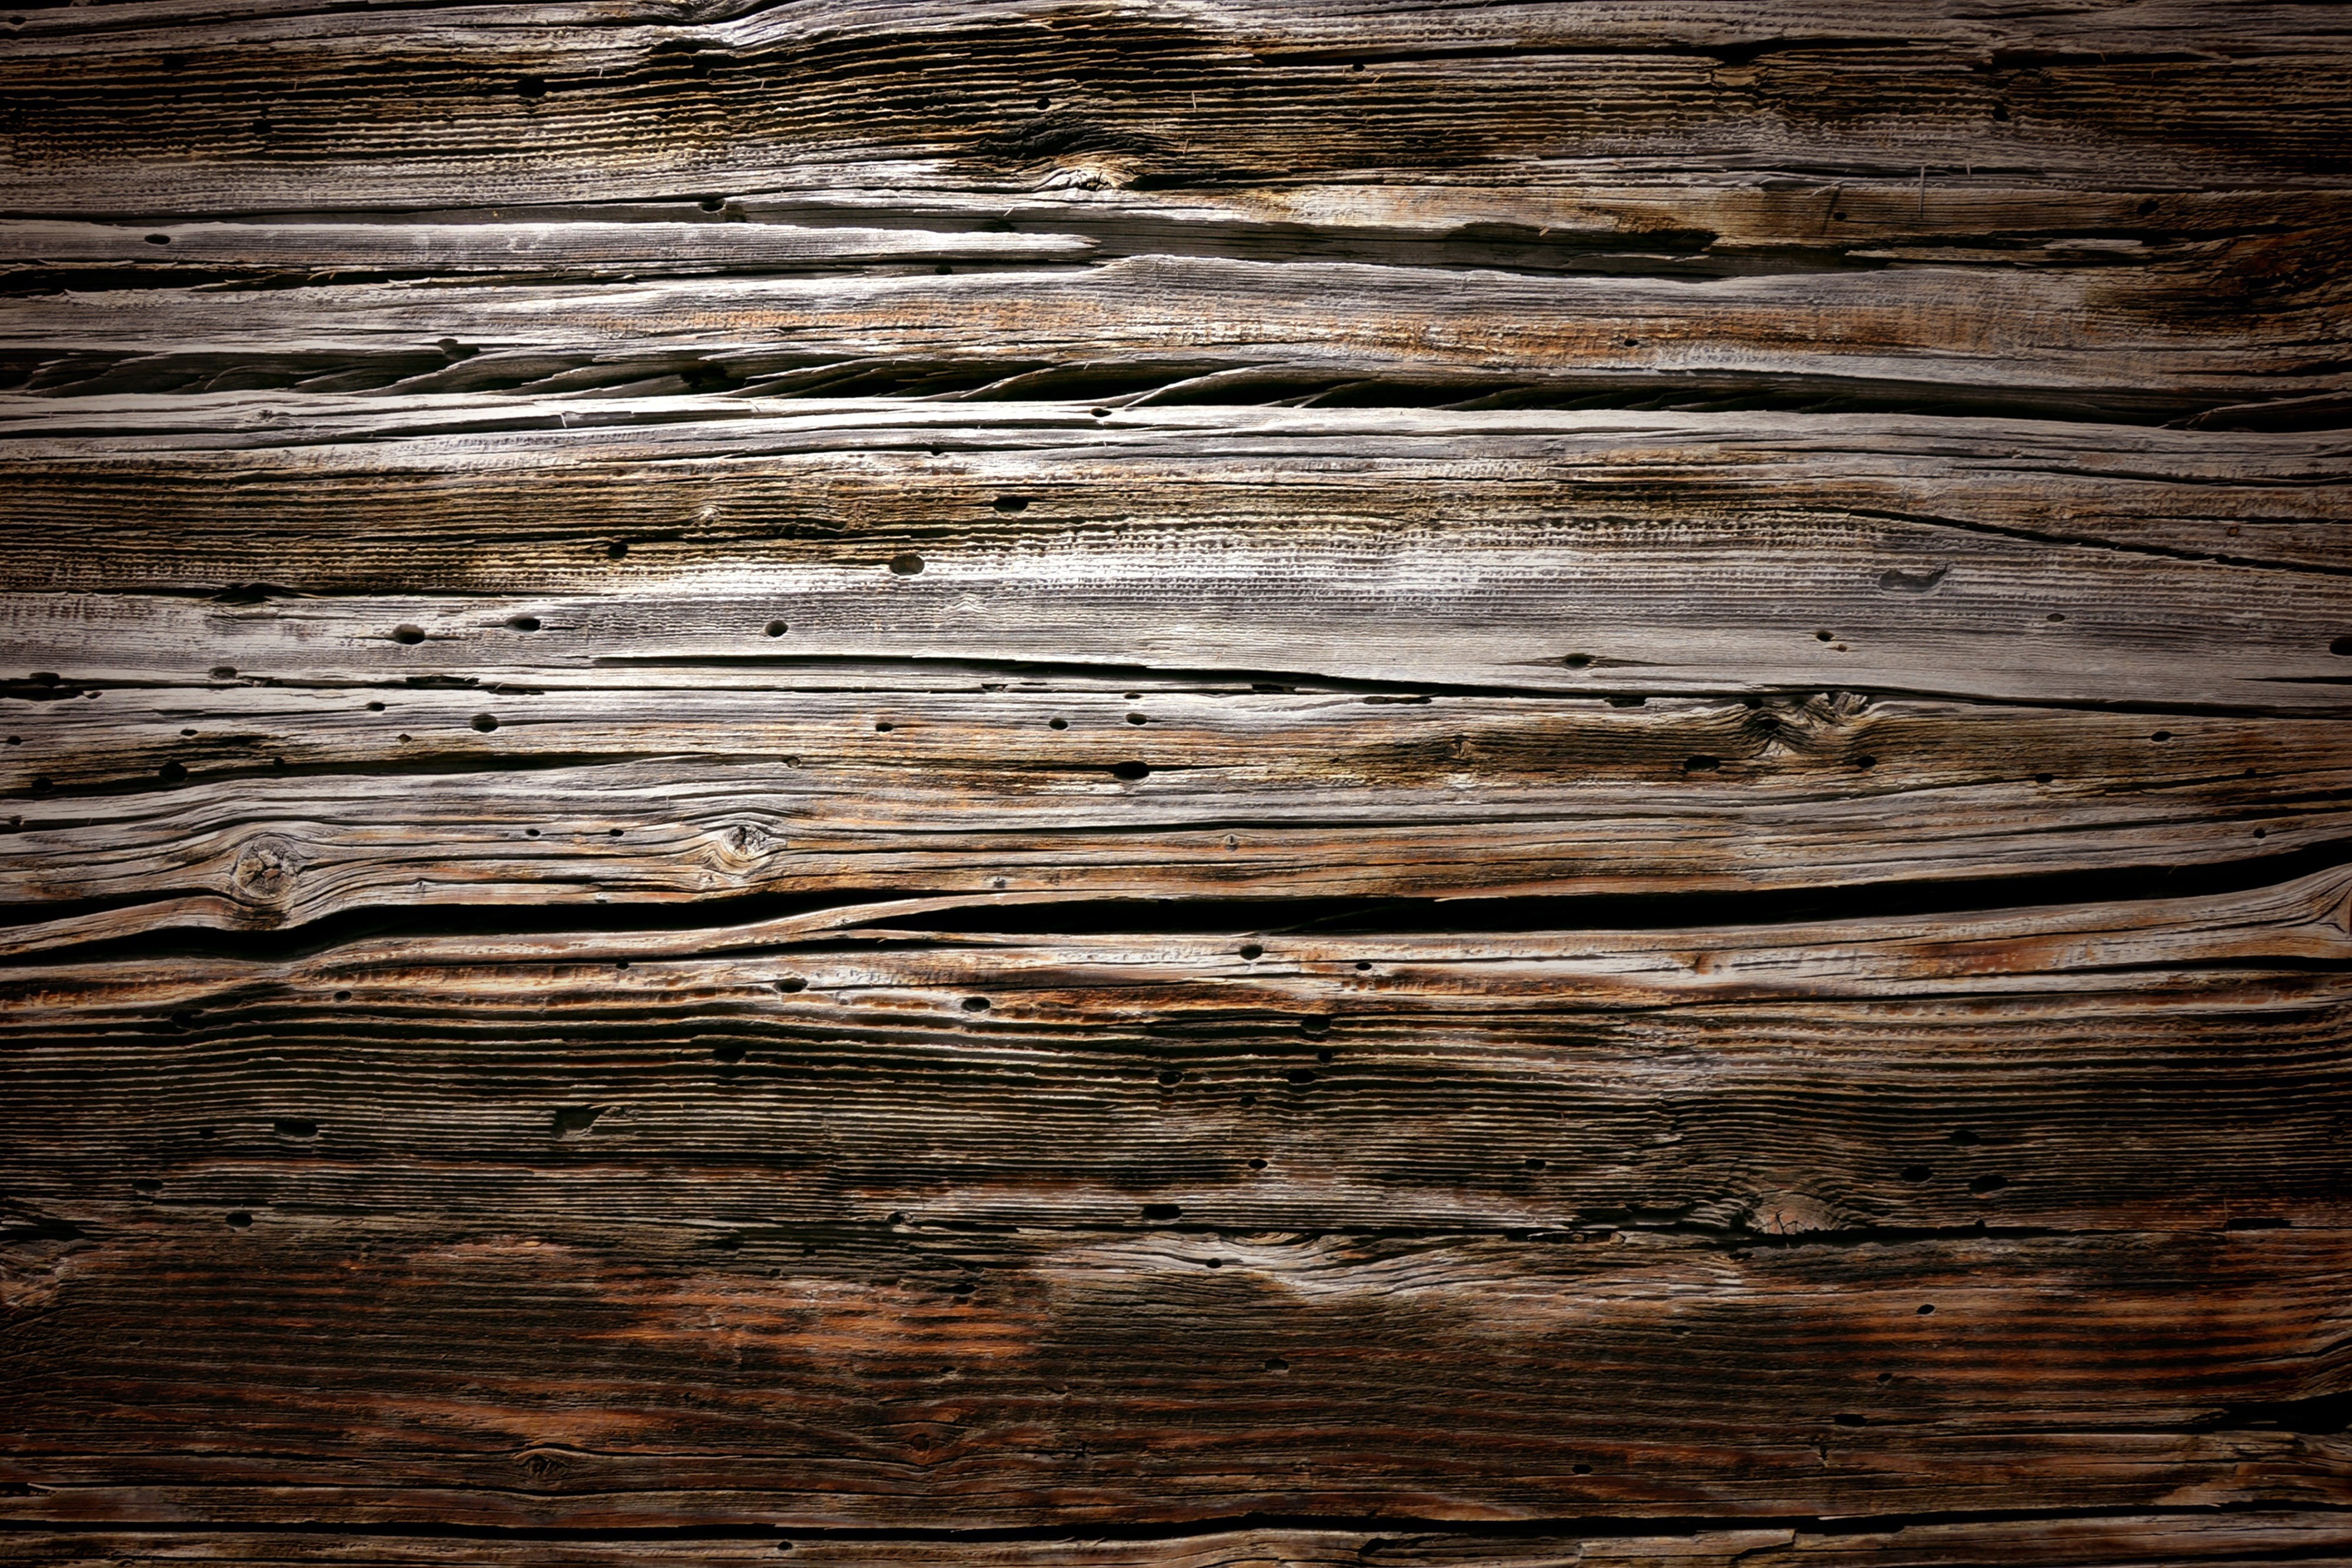 Weathered wood photo